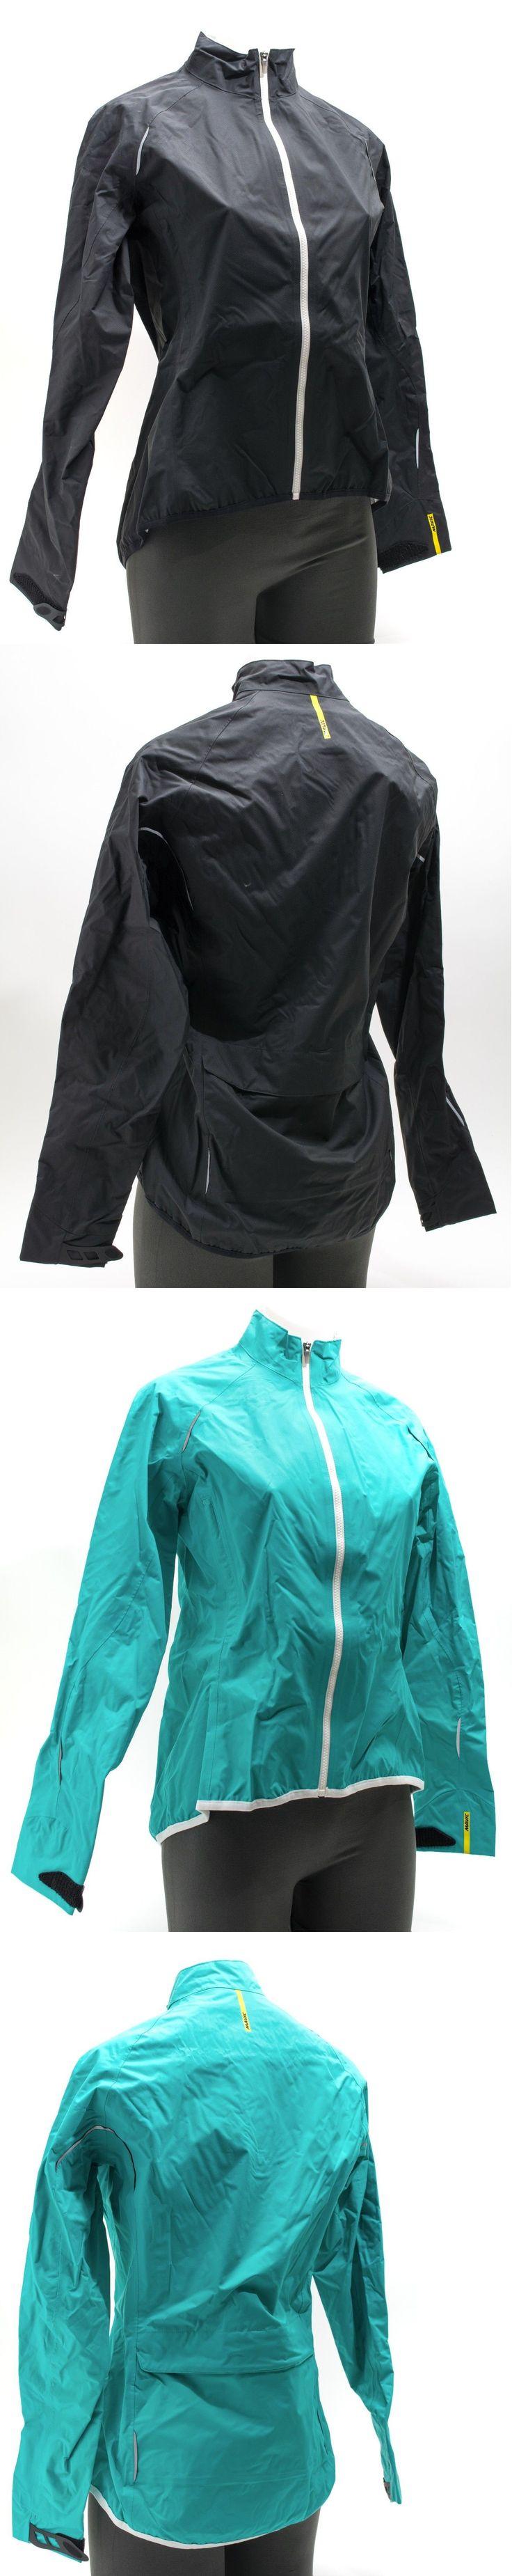 Jackets 36124: Mavic Women Ksyrium Elite H2o Road Mountain Bike Cycling Rain Wind Jacket Medium -> BUY IT NOW ONLY: $39.95 on eBay!